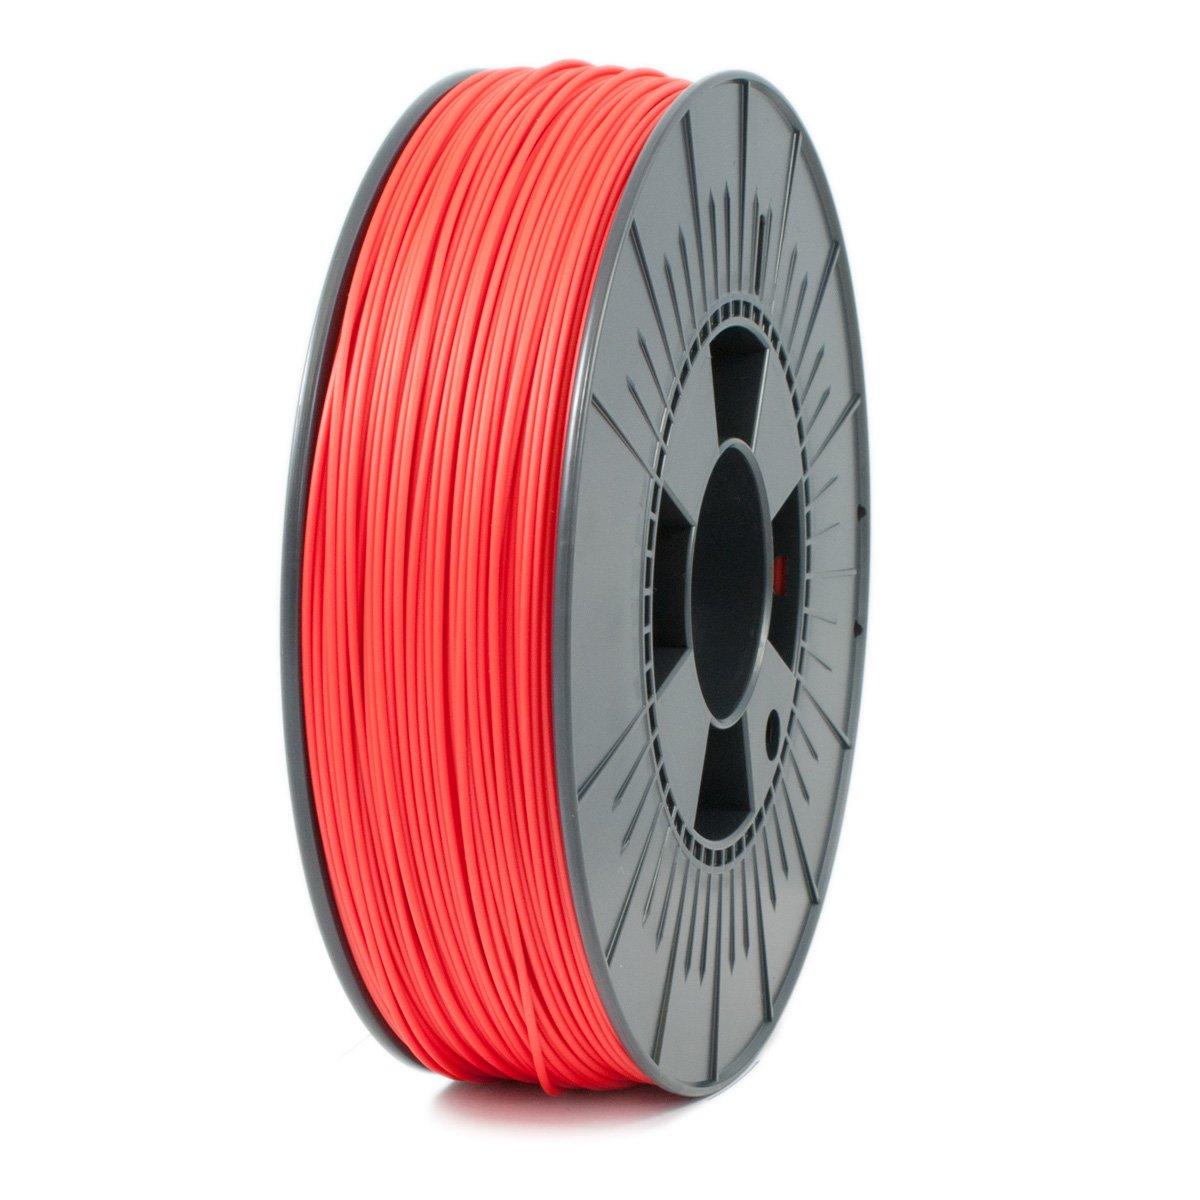 Ice Filaments ICEFIL1HPS148 Filamento HIPS, 1,75 mm, 0,75 kg, Rojo Dutch Filaments